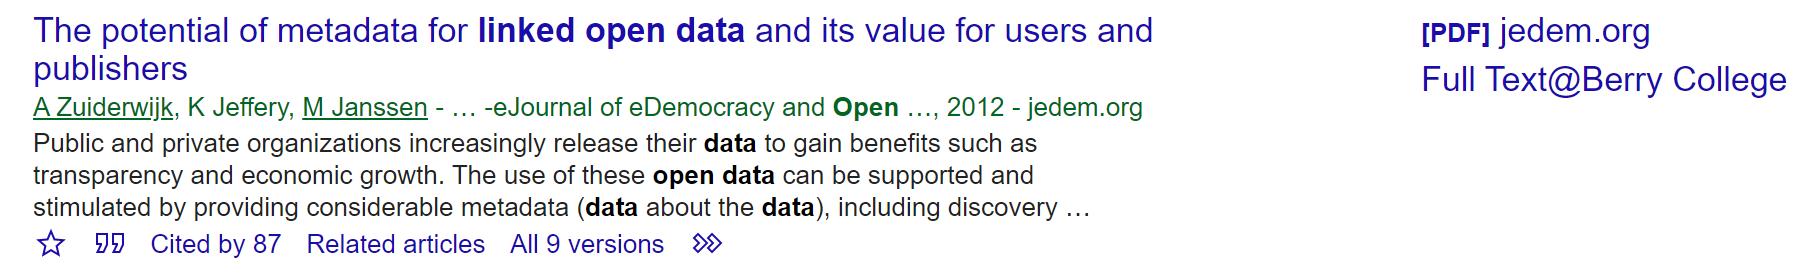 Google Scholar entry